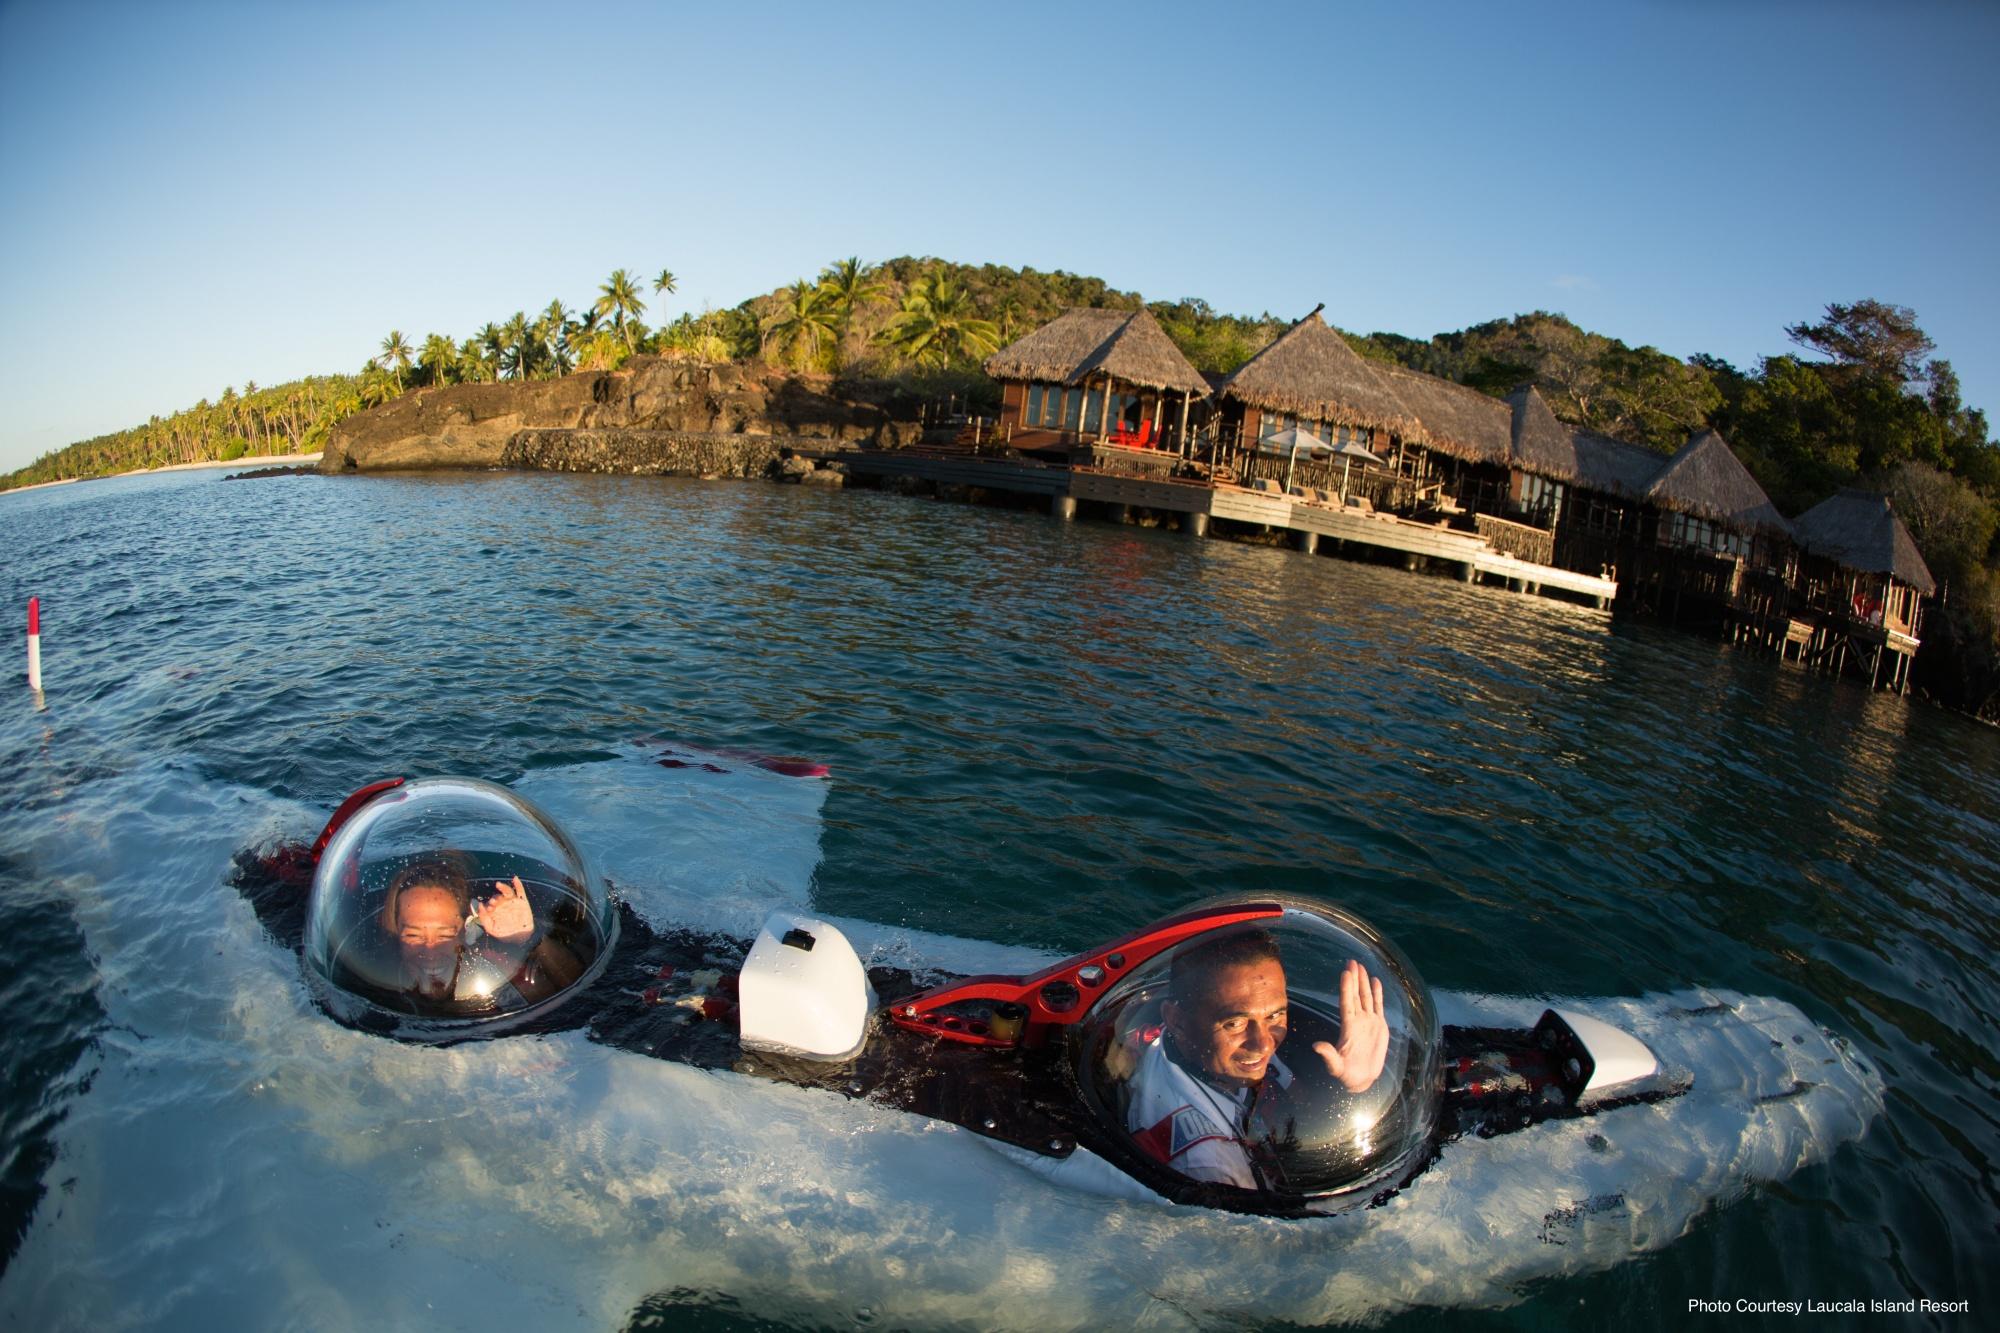 Laucala-Island-DeepFlight-Submarine-Overwater-Villa-2